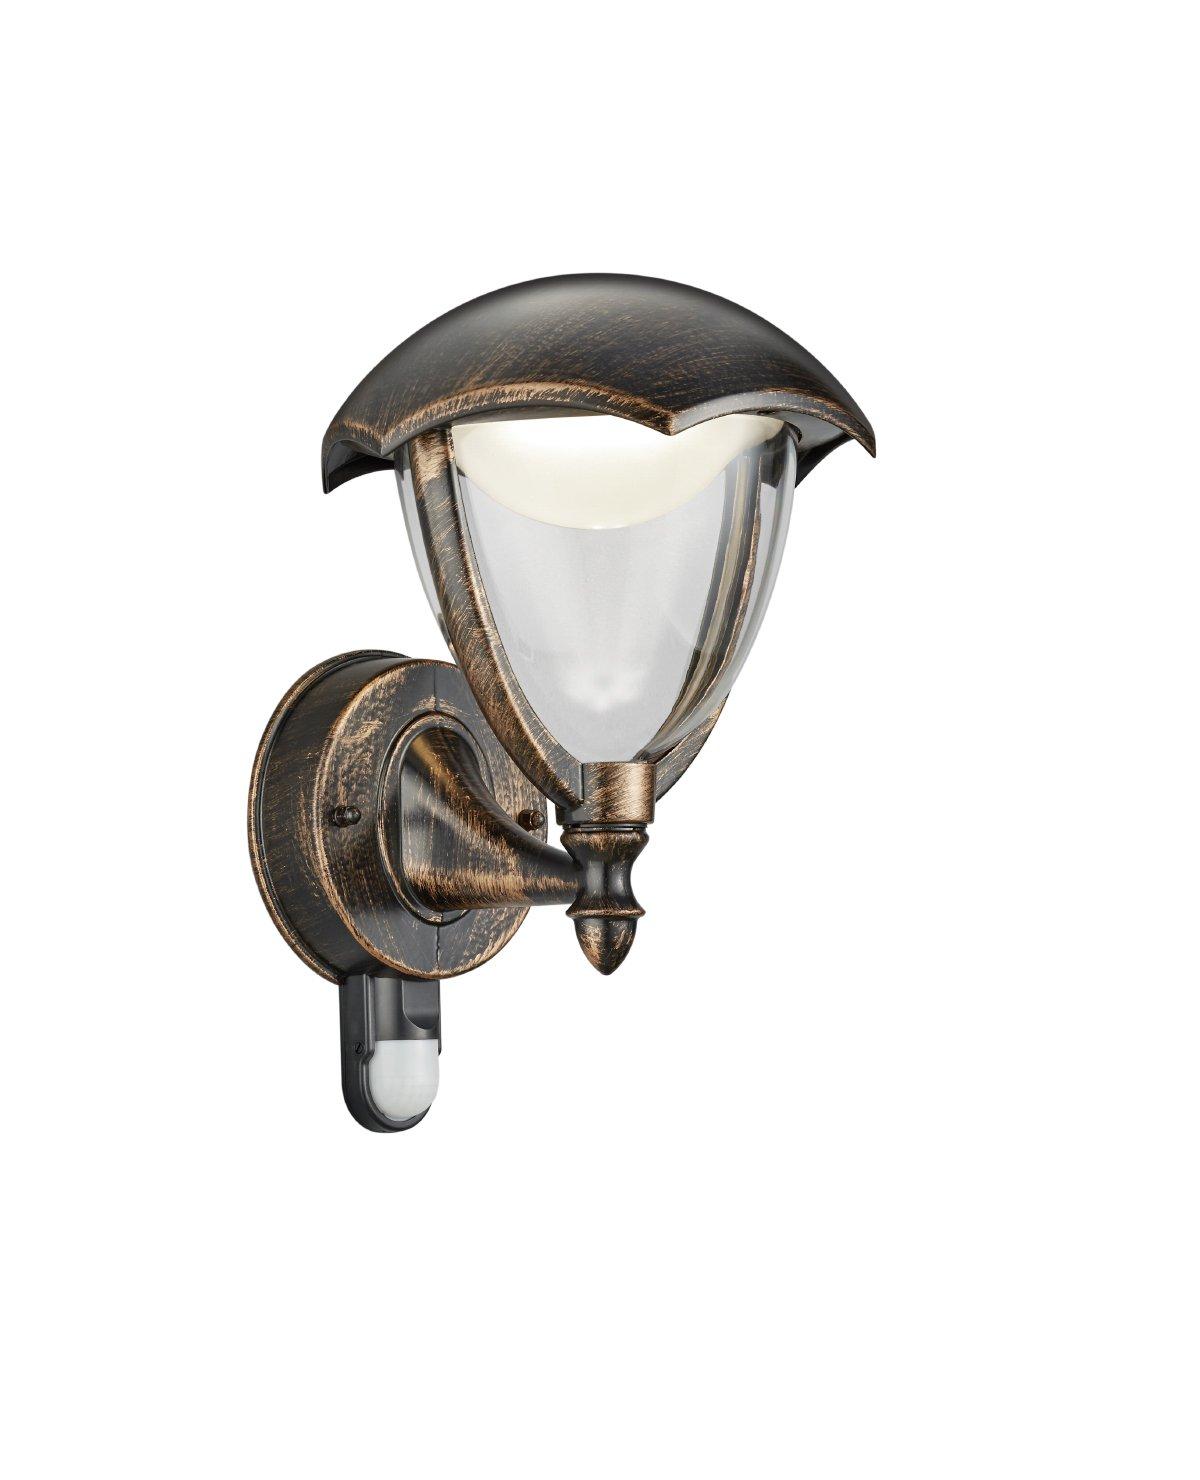 Trio Leuchten LED Au/ßenleuchte Gracht 421960128 1x 6 Watt Druckguss Aluminium rostfarbig antik